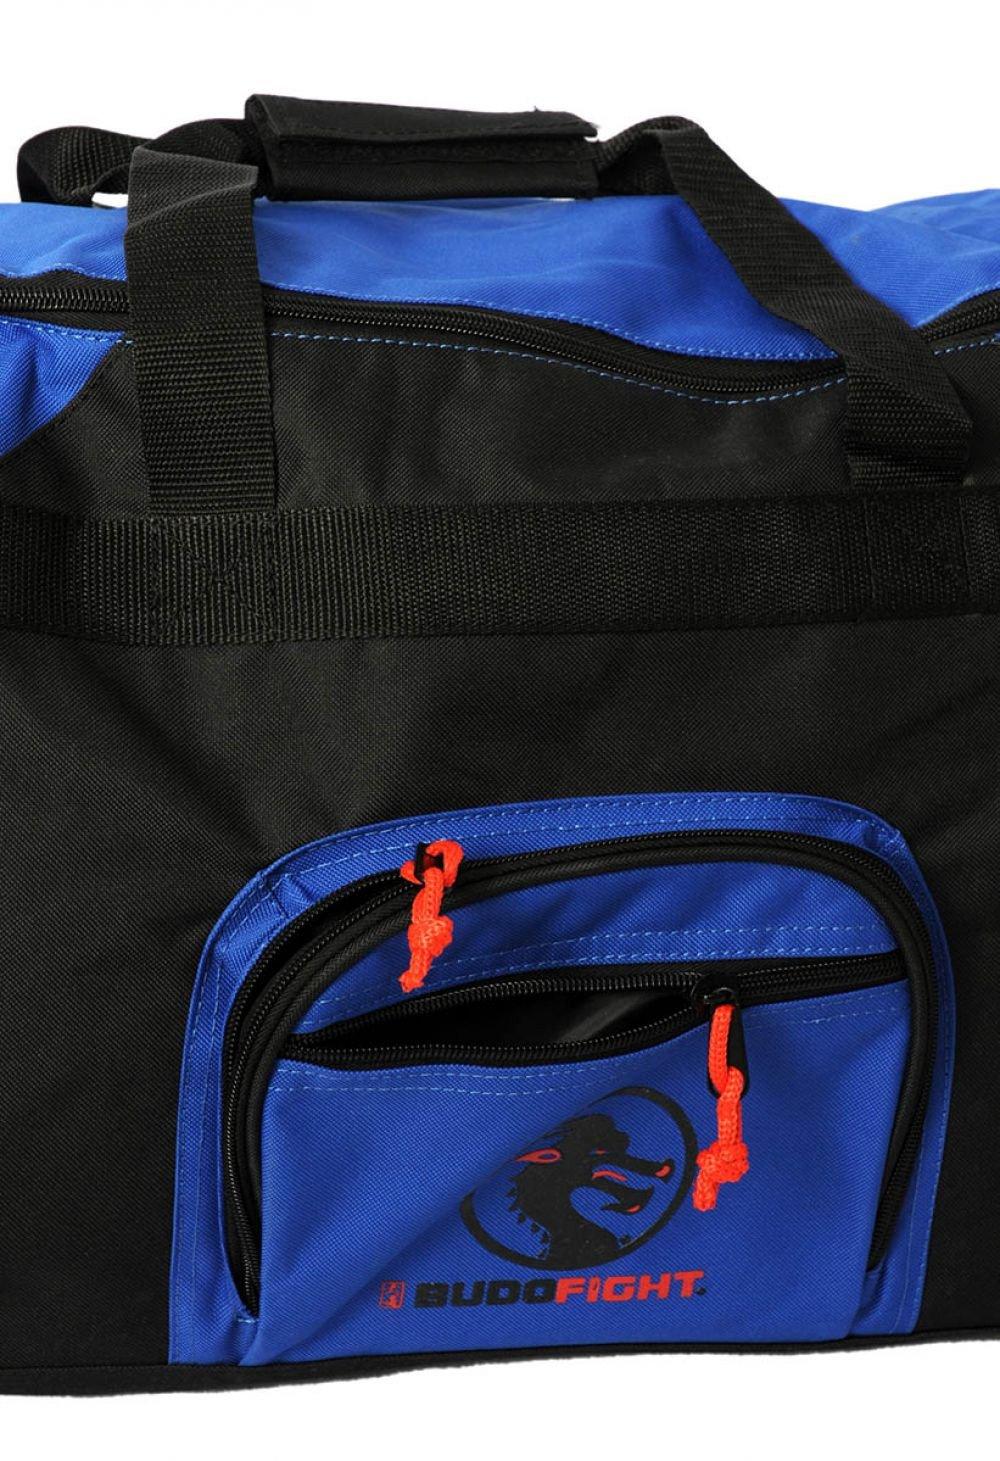 Sac de Sport Hong en Bleu Taille Medium